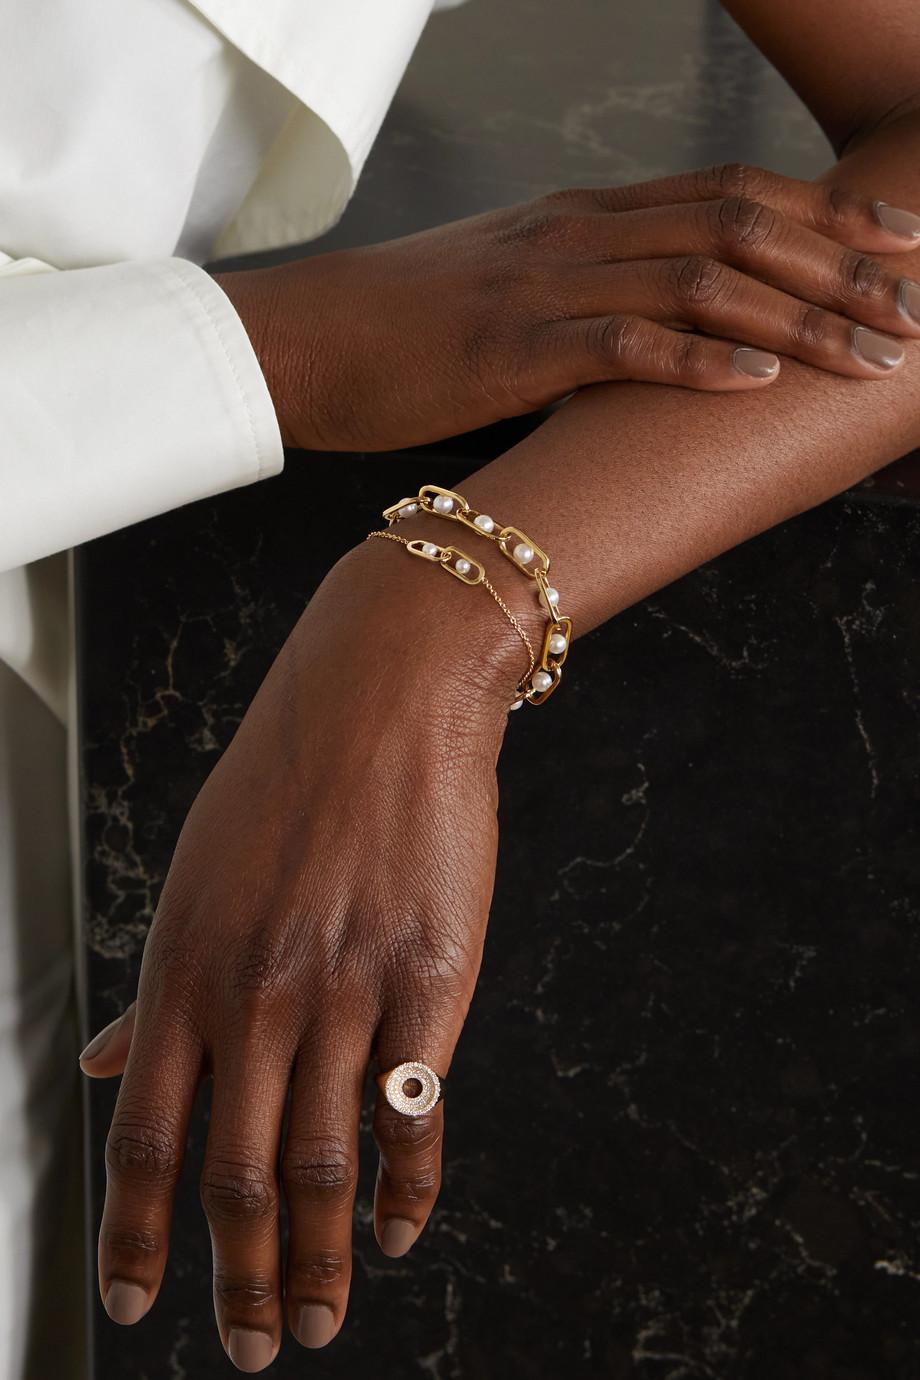 State Property Inversion Armband aus 18 Karat Gold mit Perlen